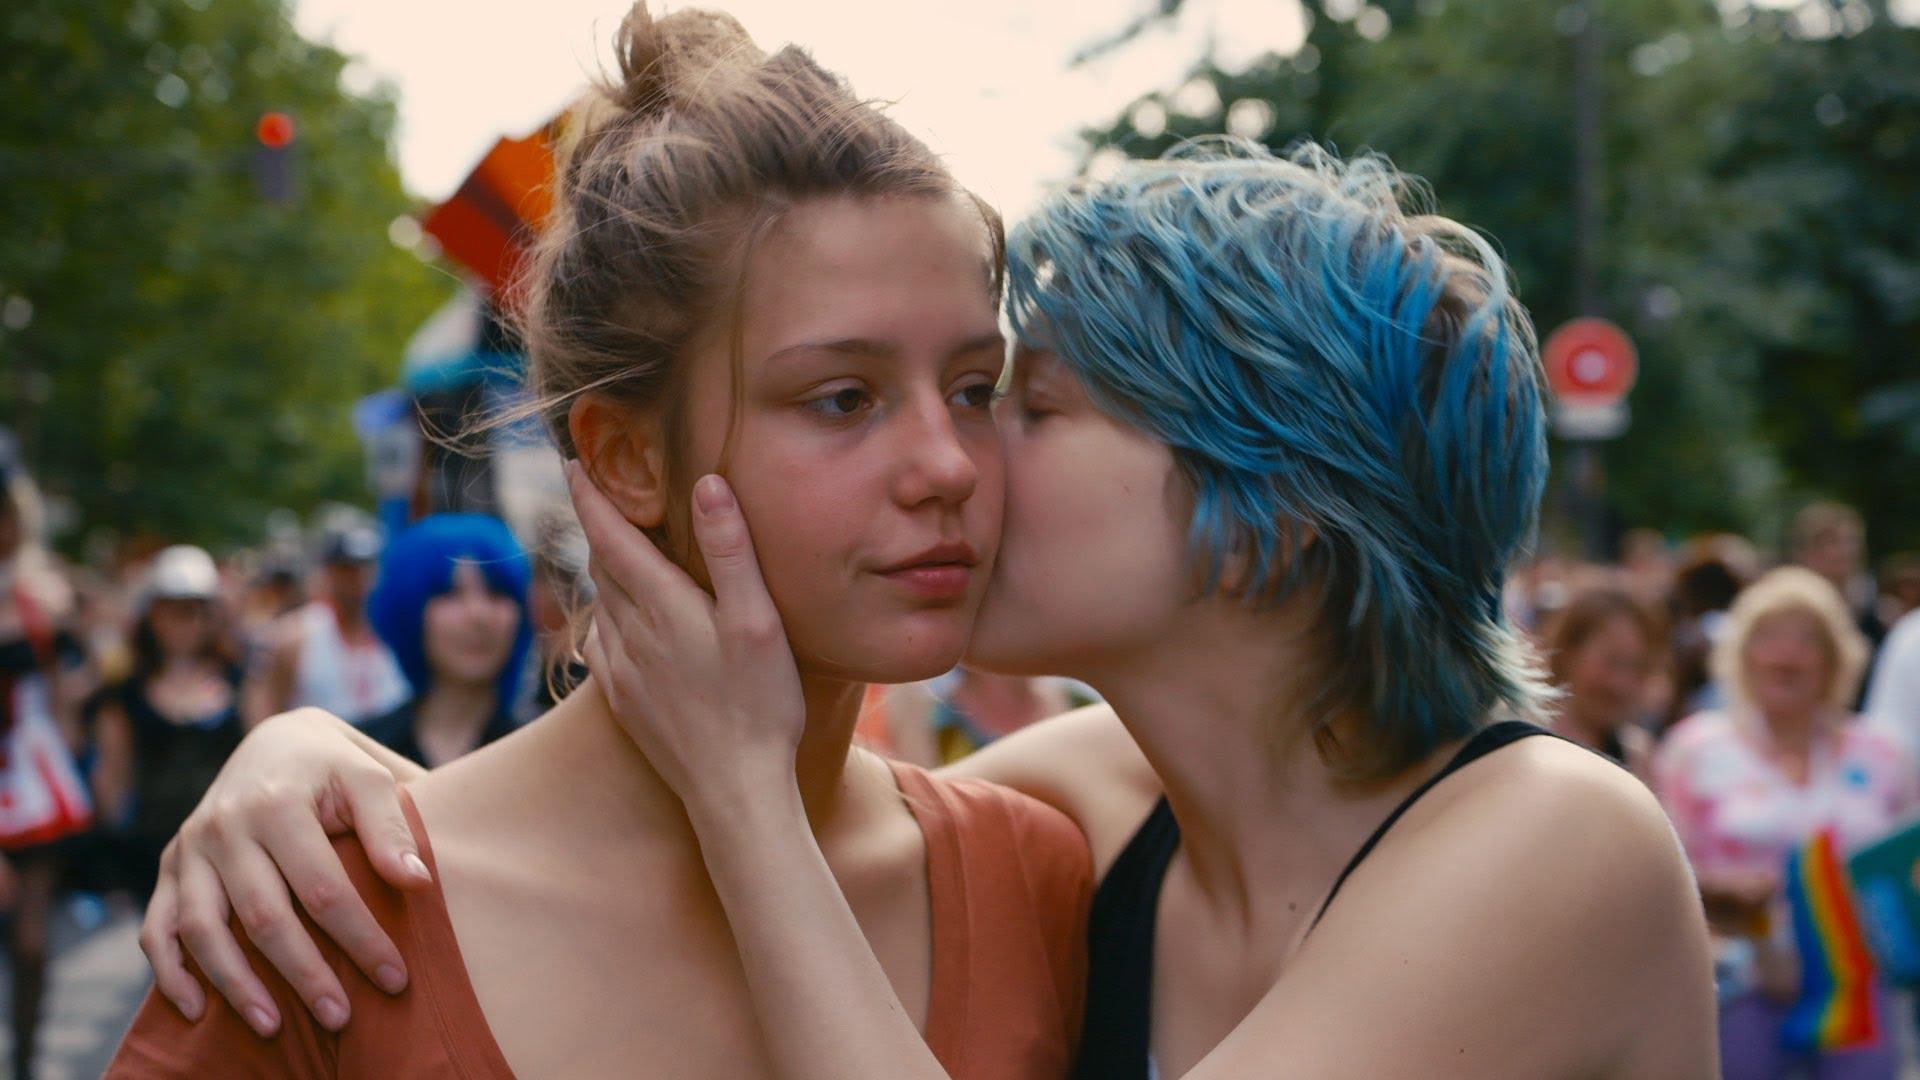 #78) Blue is the Warmest Color - (2013 - dir. Abdellatif Kechiche)